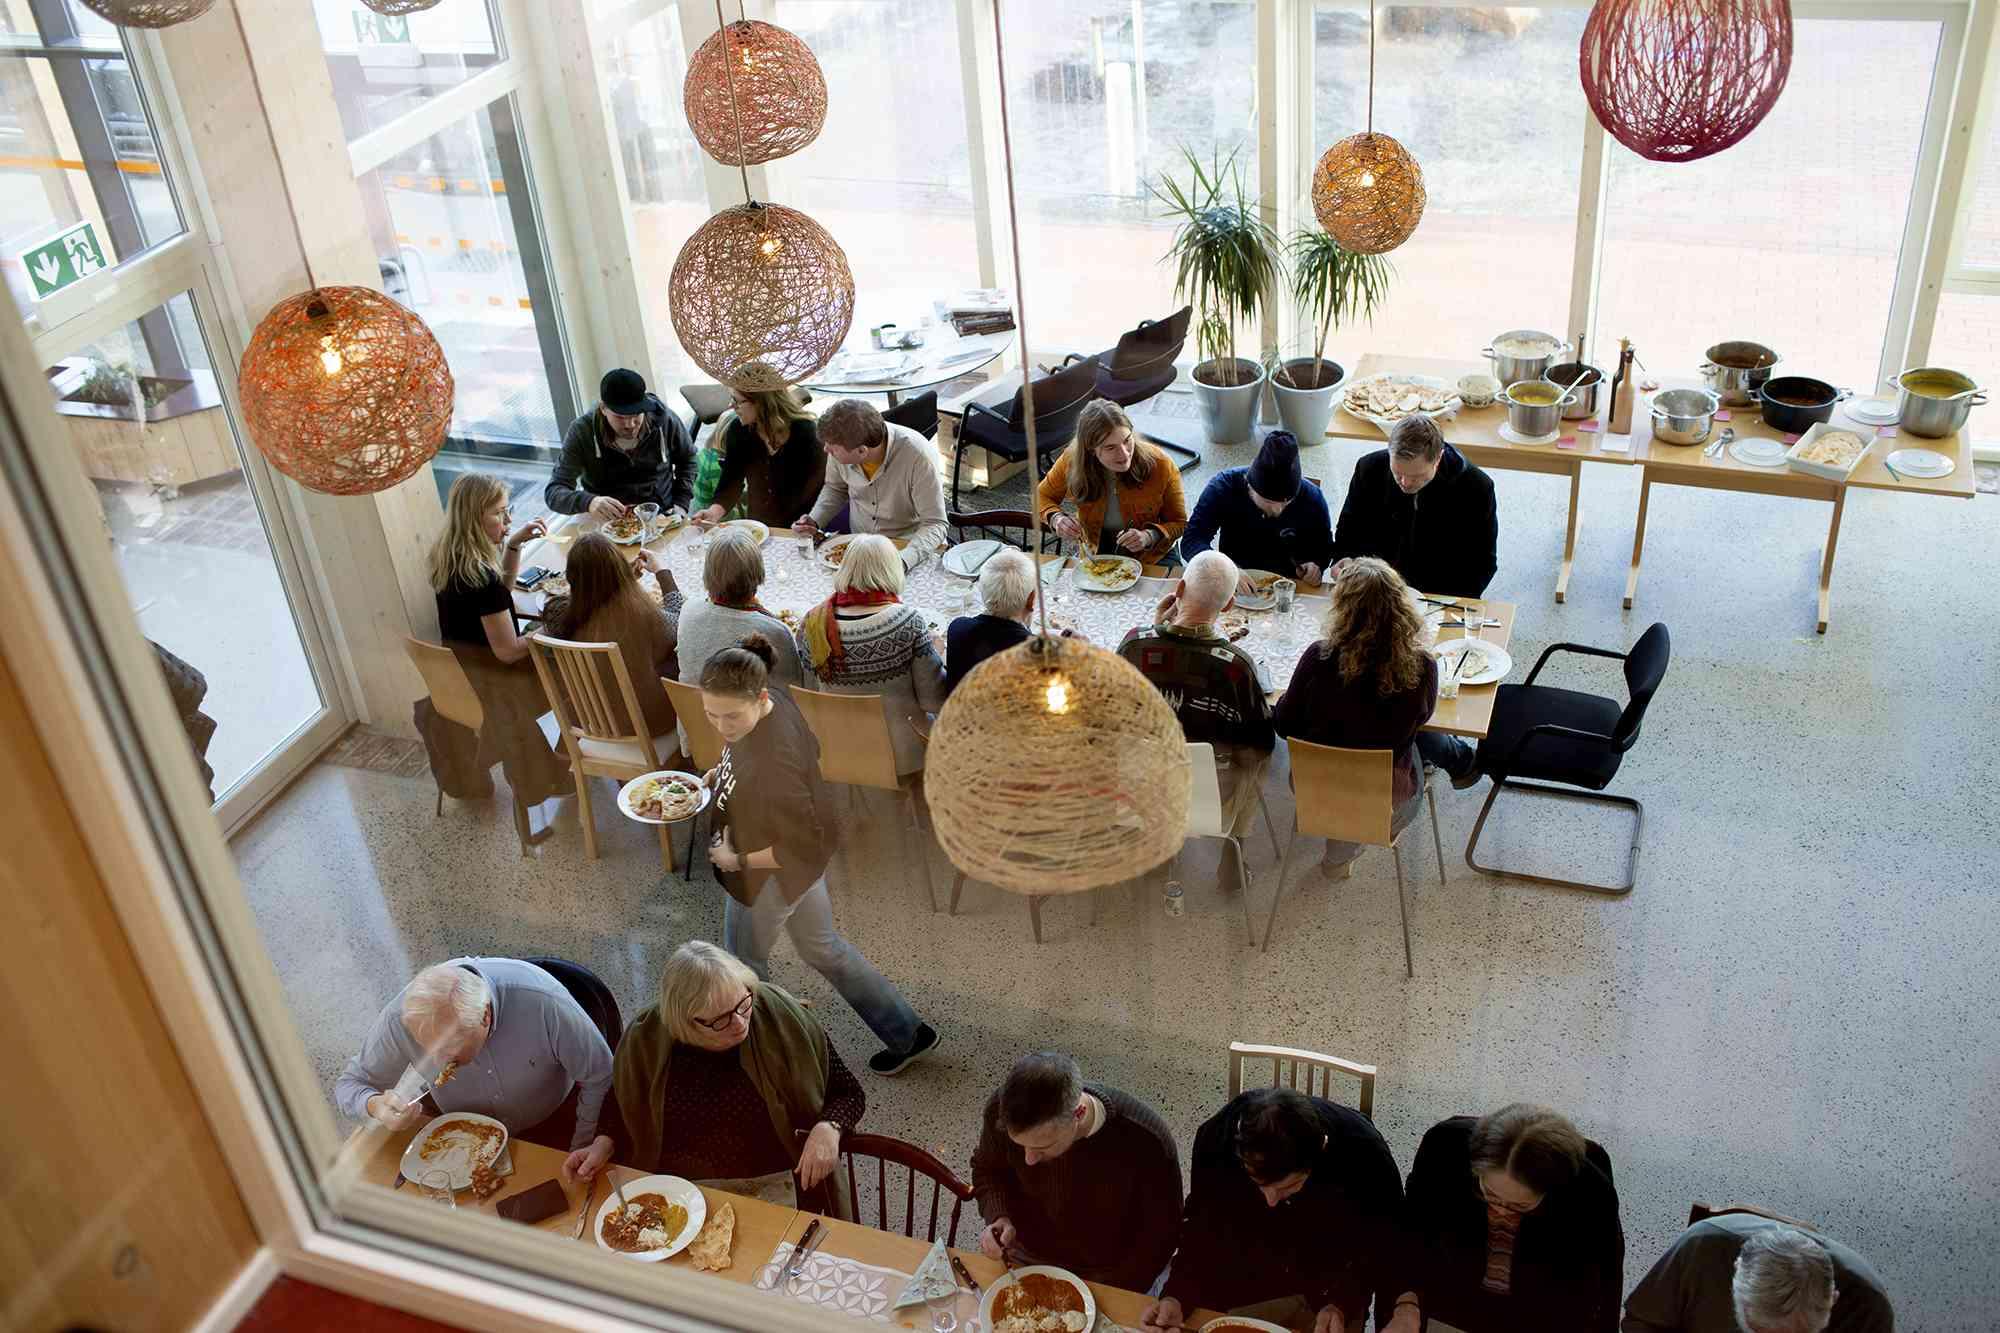 Vindmøllebakken Cohousing Project by Helen & Hard Architects dining area